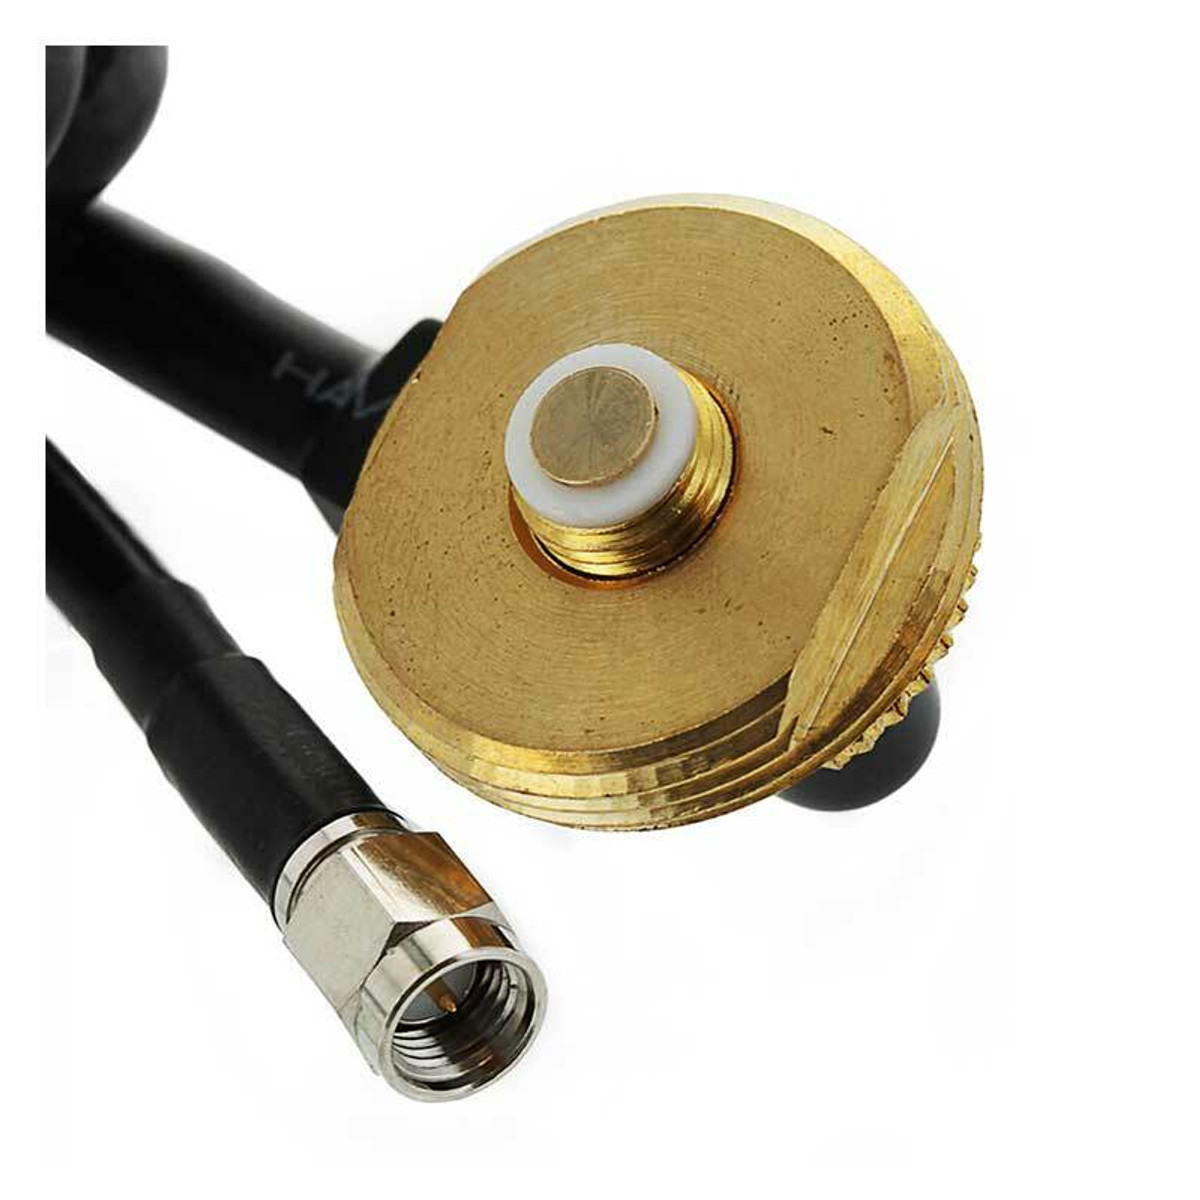 Wilson Electronics weBoost Wilson 905814-B NMO Antenna Mount or SMA to FME